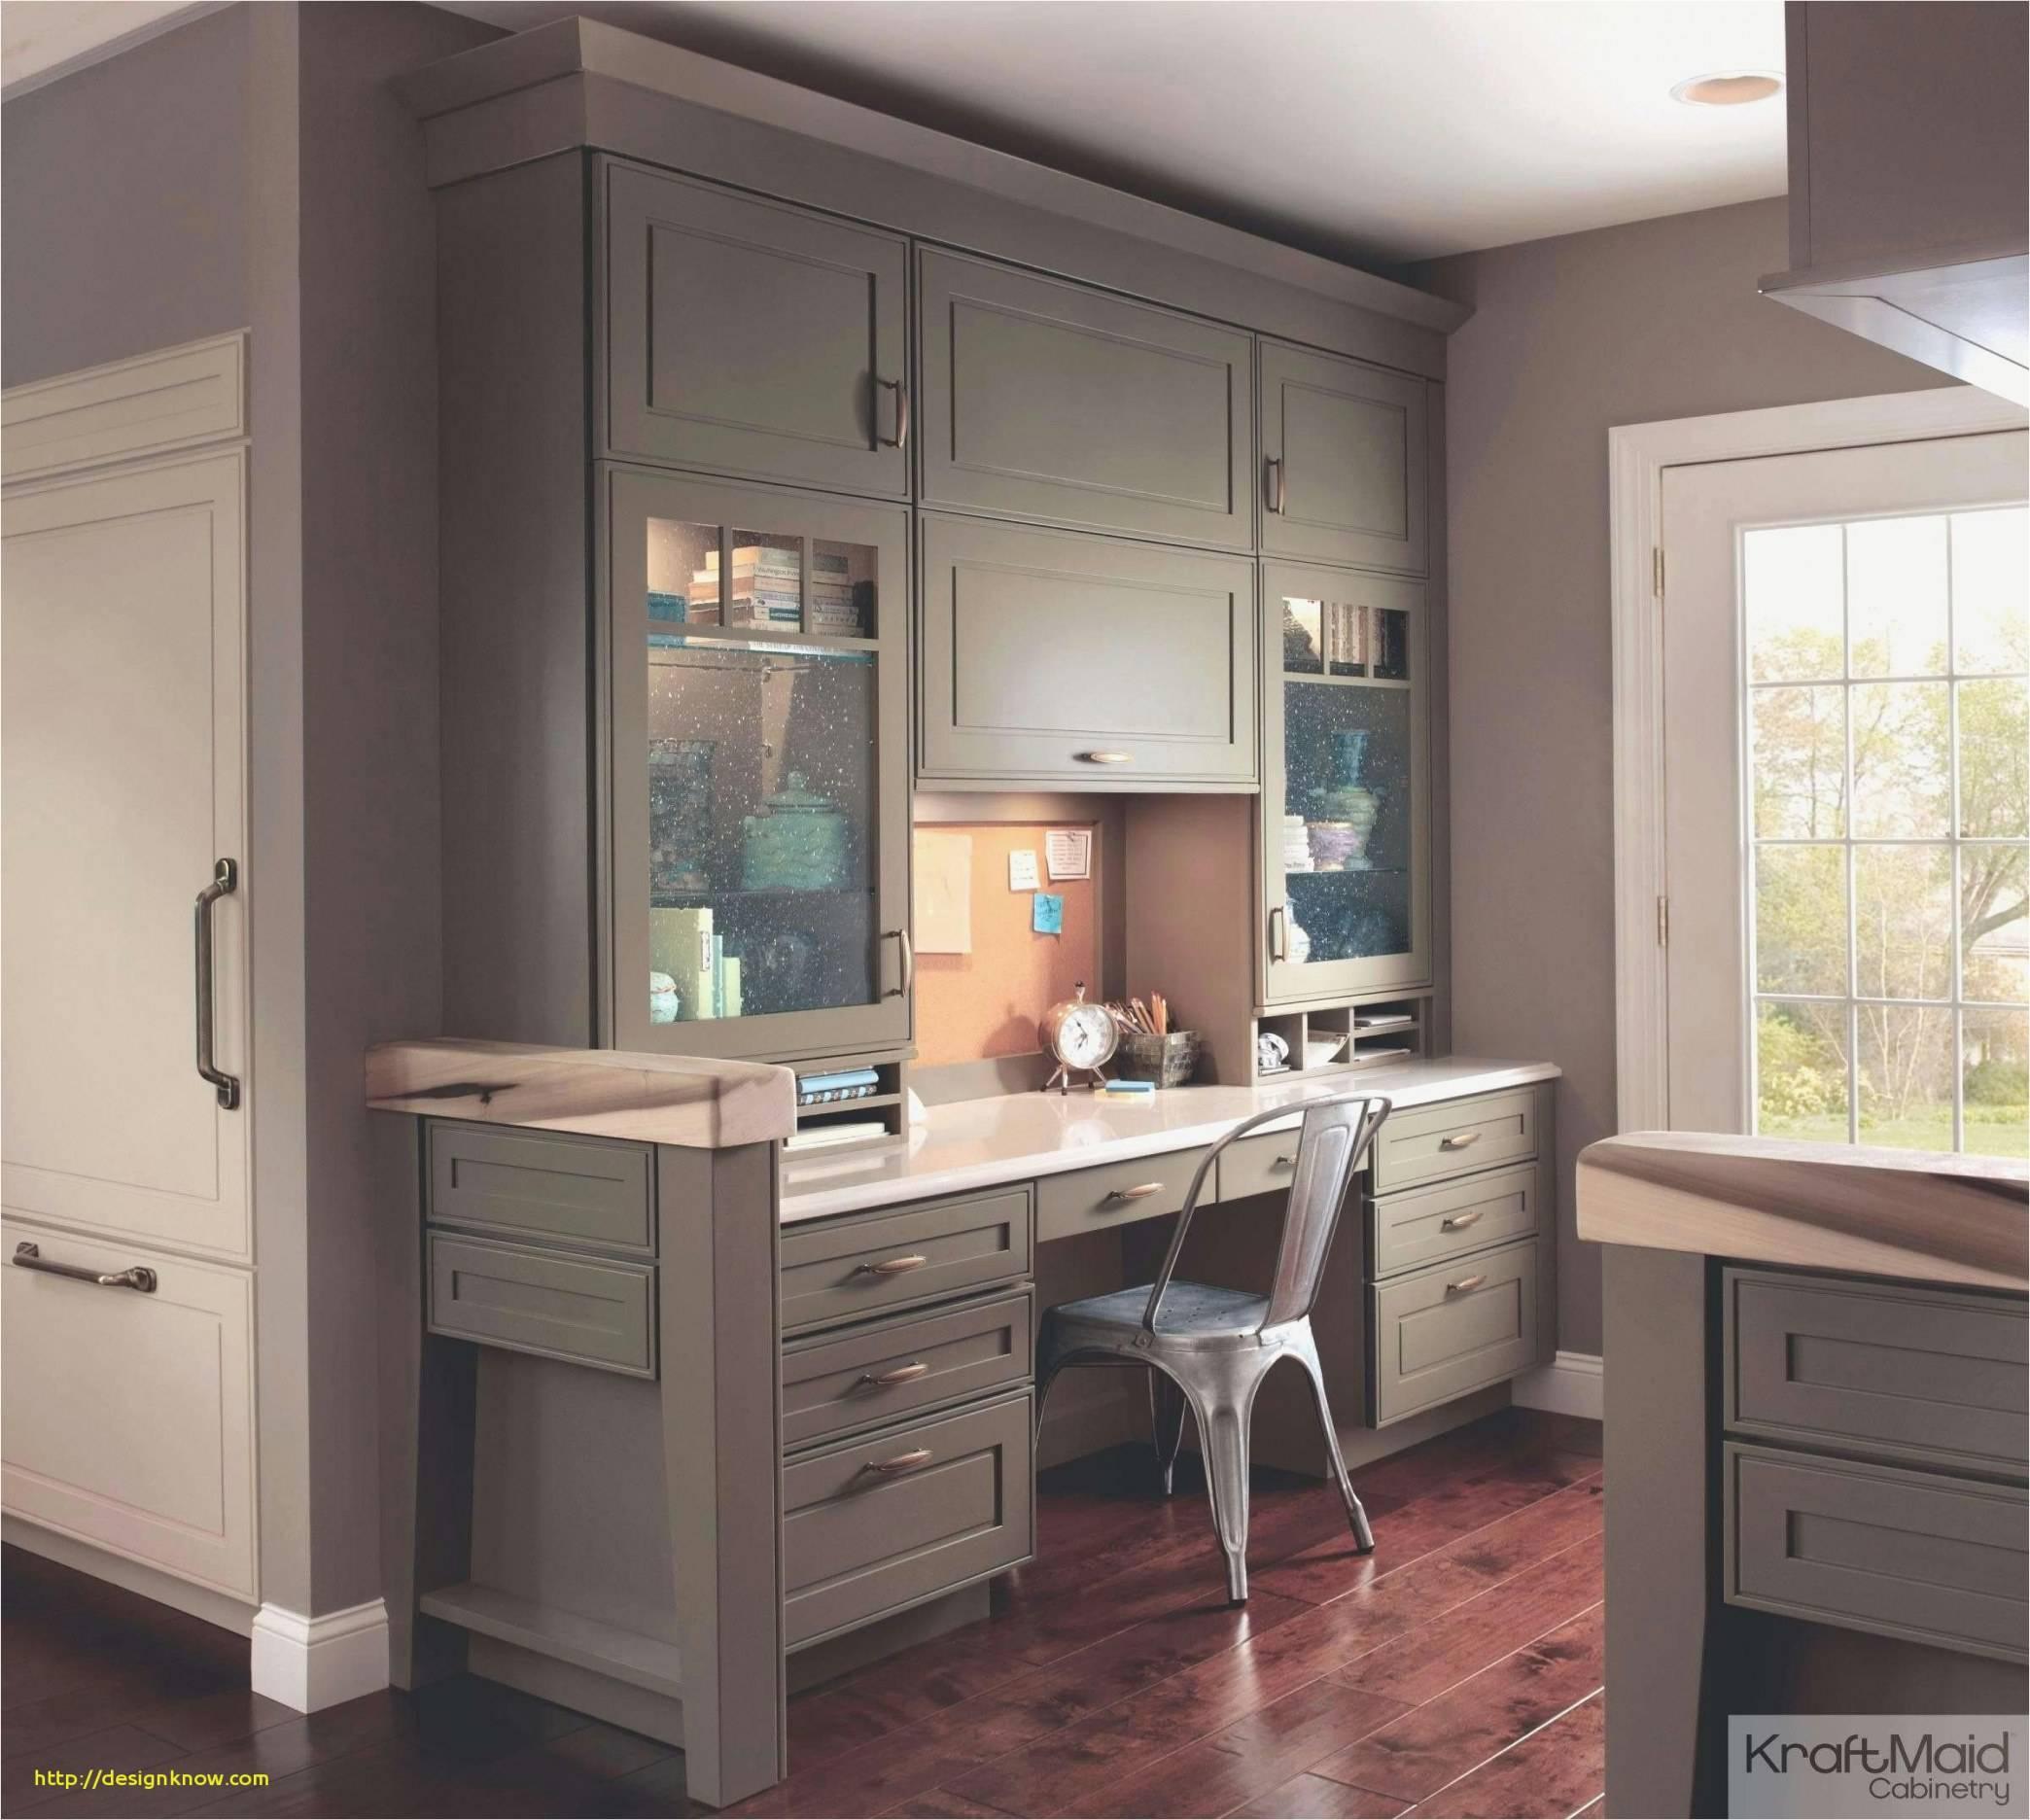 bedroom storage ideas best storage ideas for small kitchens of bedroom storage ideas